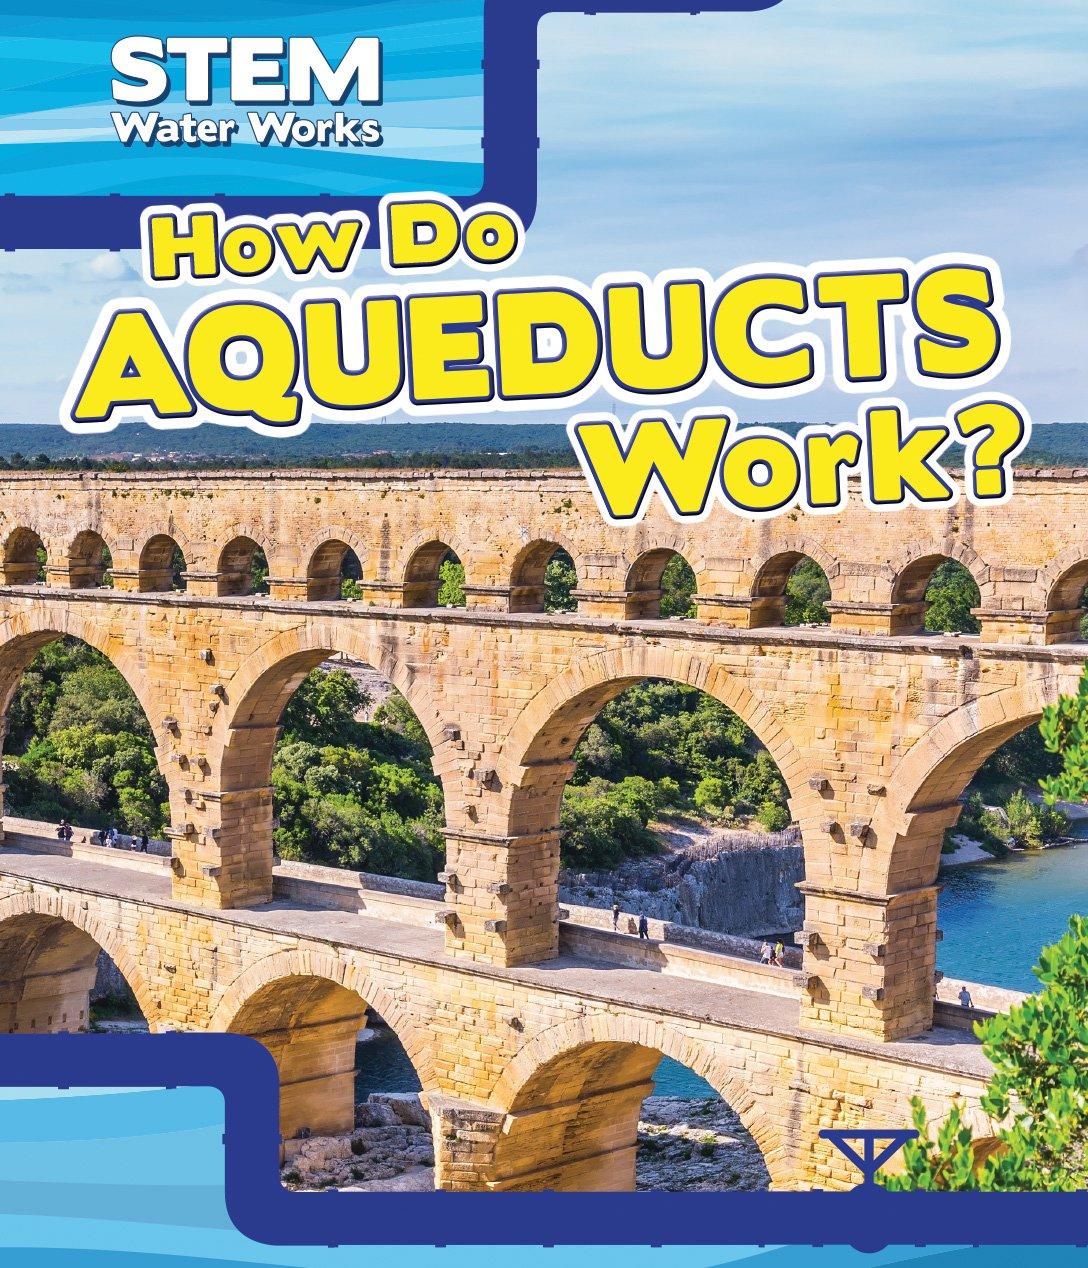 How Do Aqueducts Work? (Stem Waterworks)